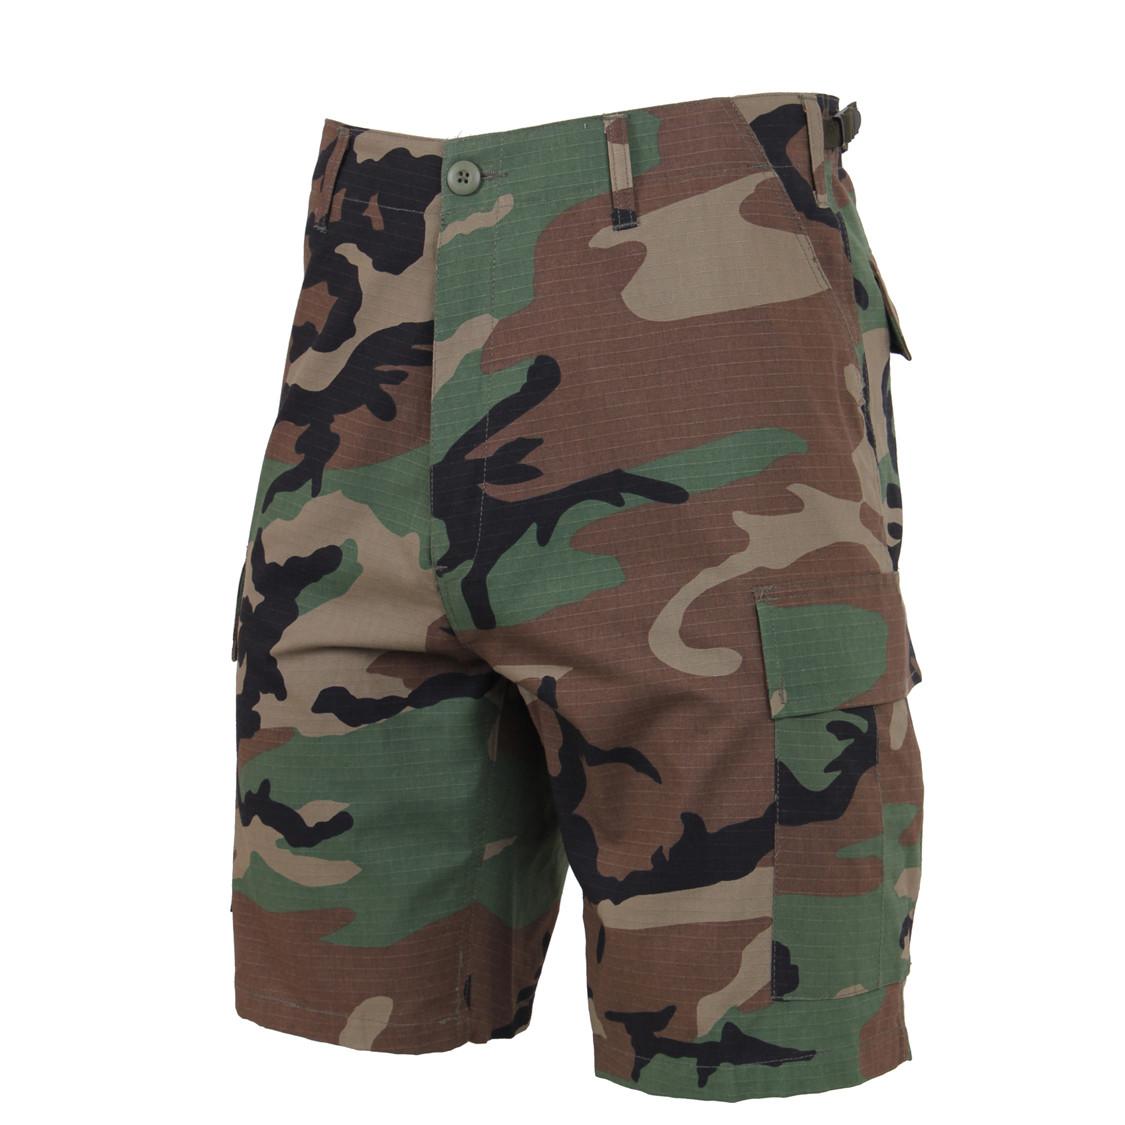 89d9c8fbf34043 Shop Woodland Camo Ripstop BDU Shorts - Fatigues Army Navy Gear